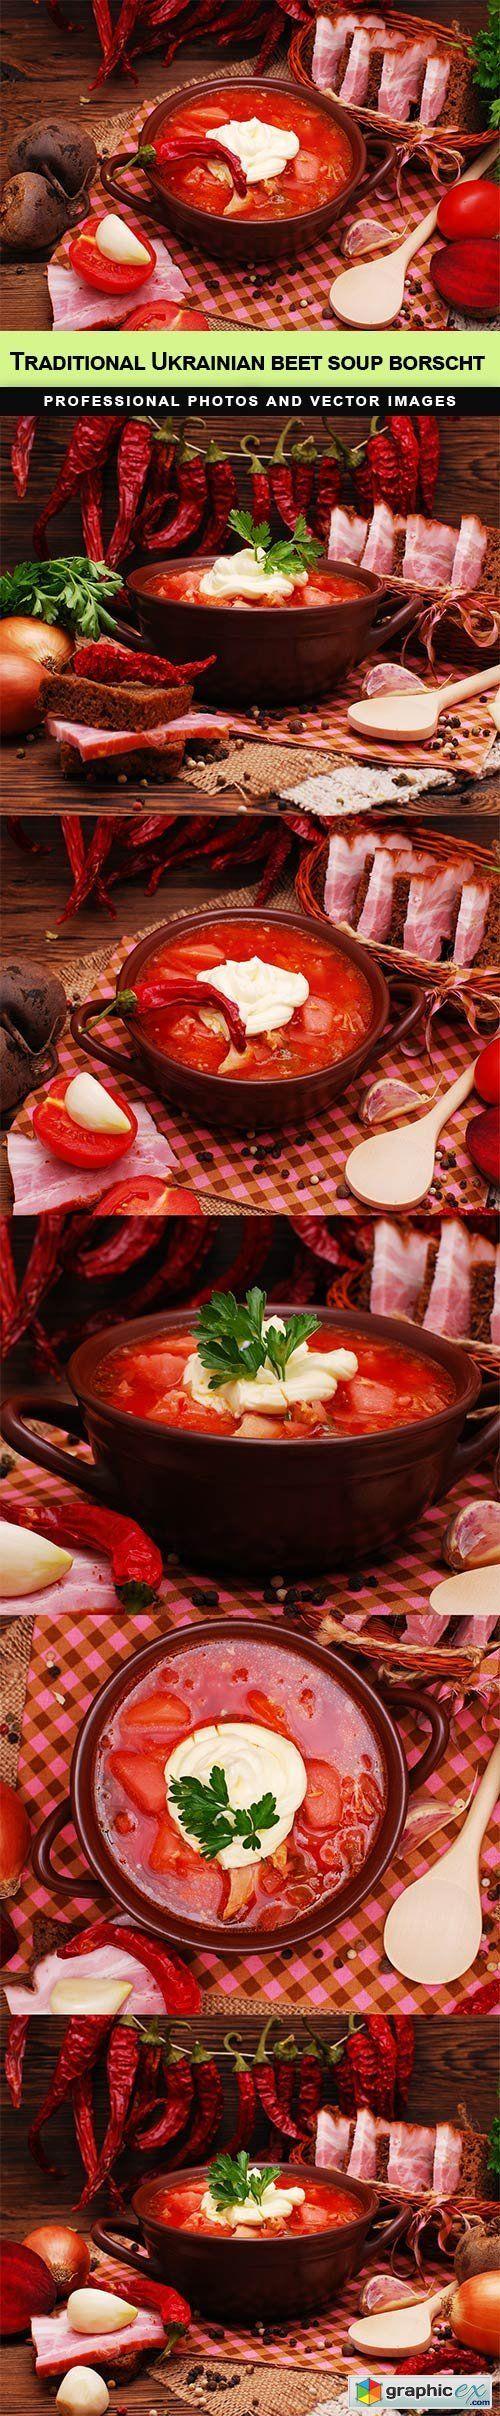 The traditional Ukrainian beet soup borscht  stock images